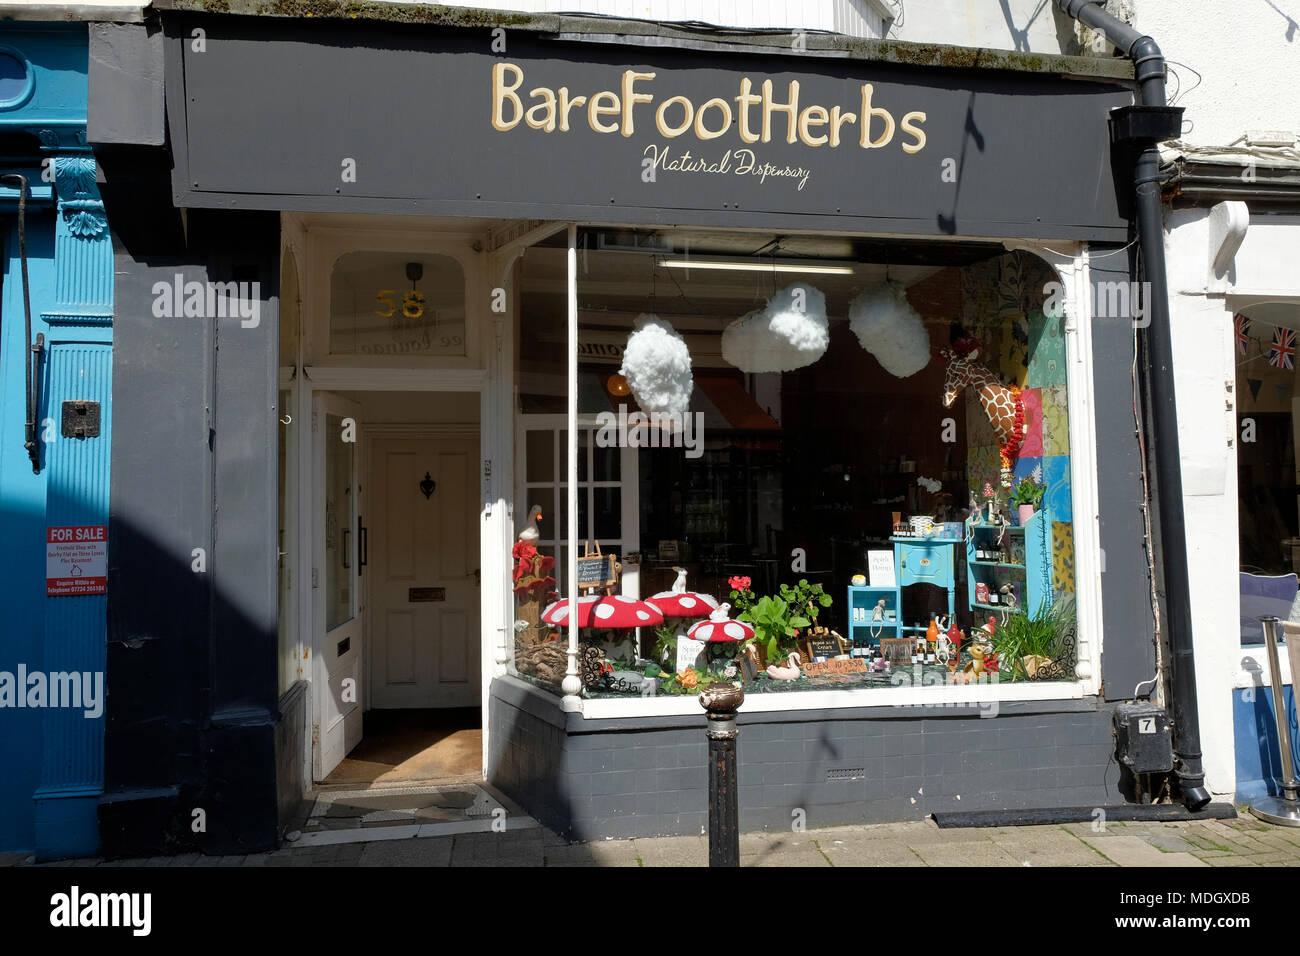 Bare foot herbs shop, Hastings, uk - Stock Image